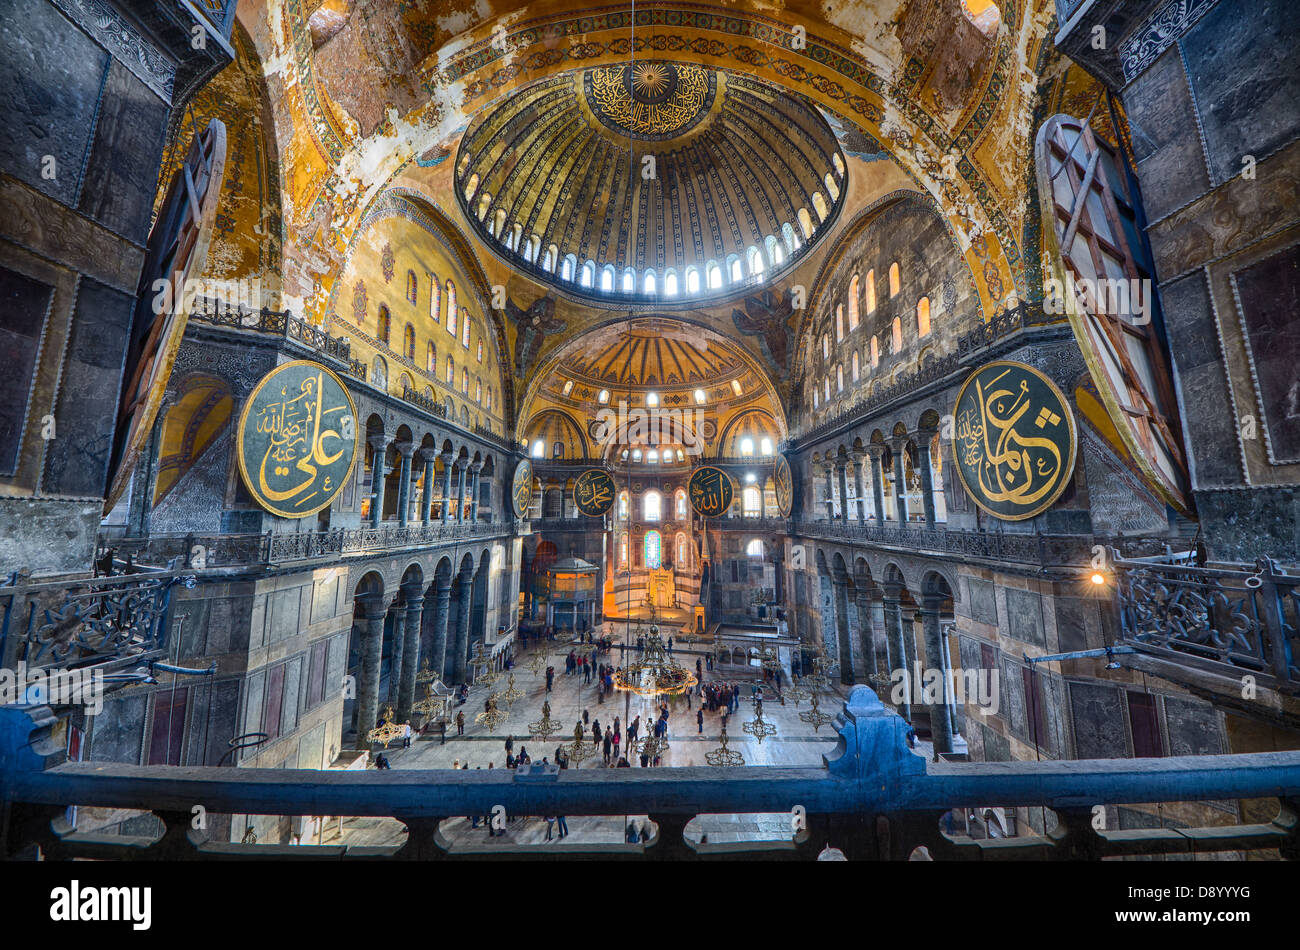 ISTANBUL - DECEMBER 2012: interiors of the Aya Sofia Mosque on December 07, 2012. The Aya Sofia Mosque is 1500 years Stock Photo